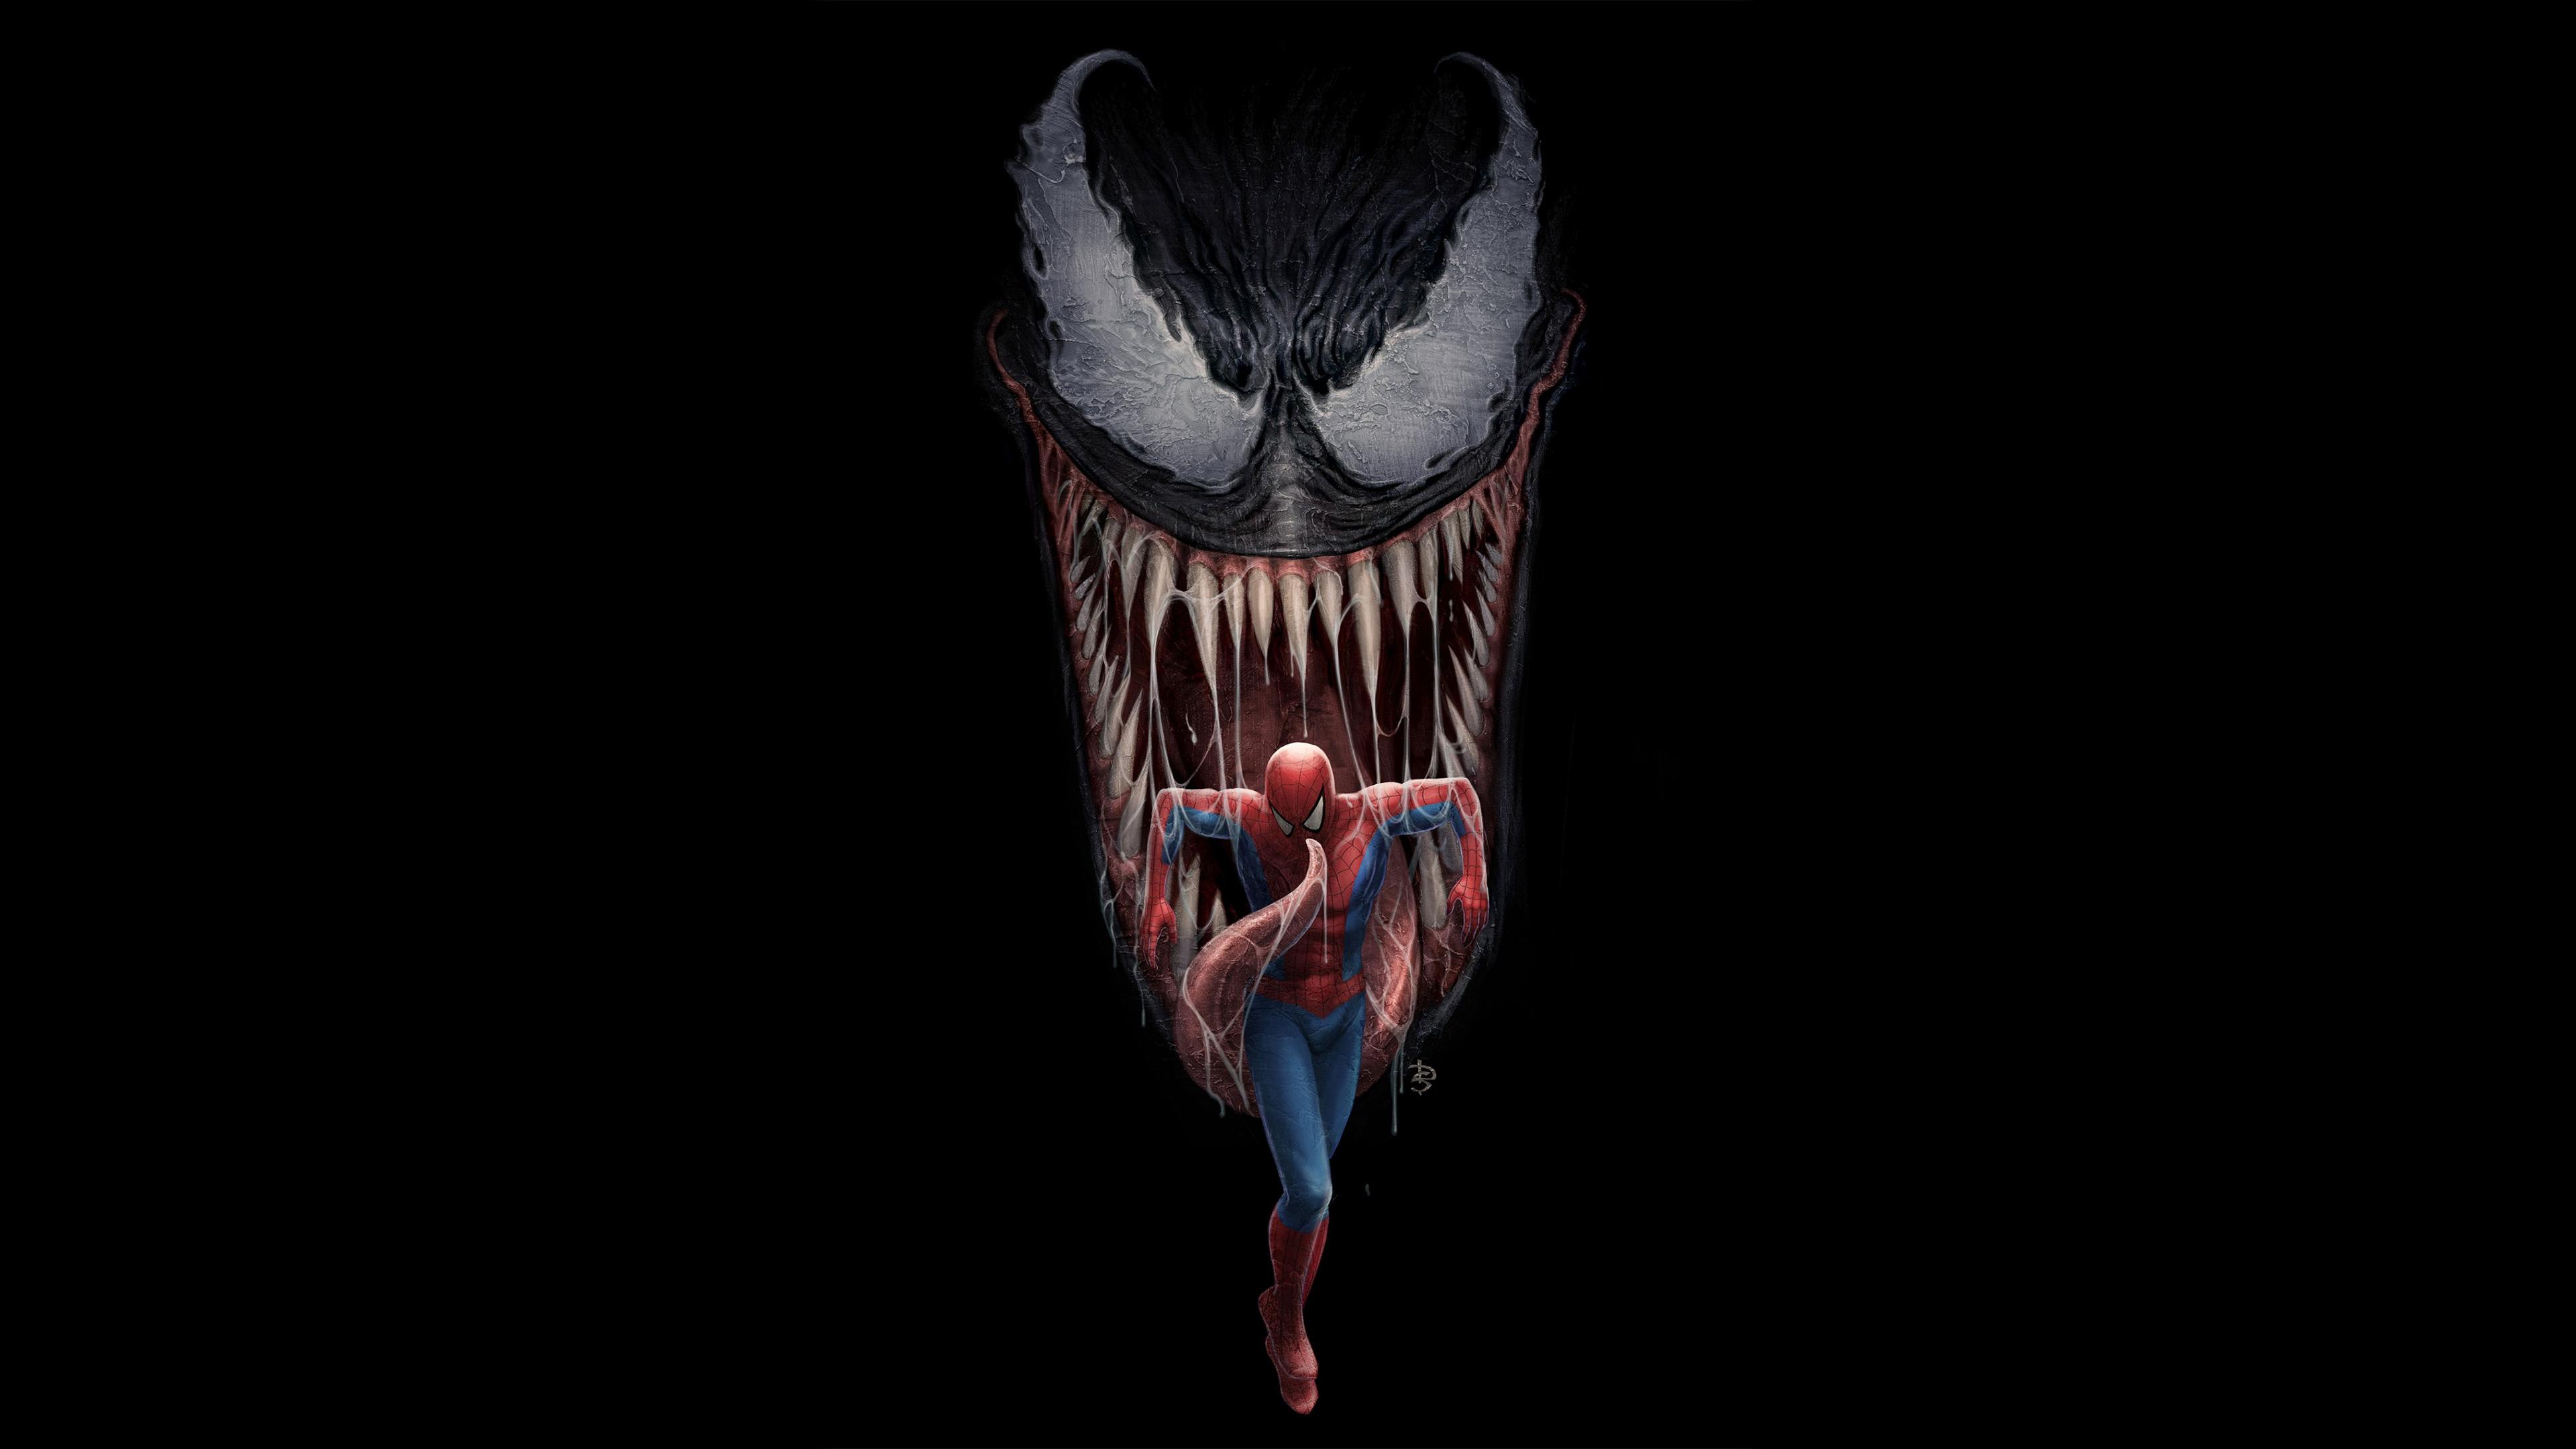 Antihero Eddie Brock Marvel Comics Monster Peter Parker Spider Man Superhero Symbiote Venom 3840x2160